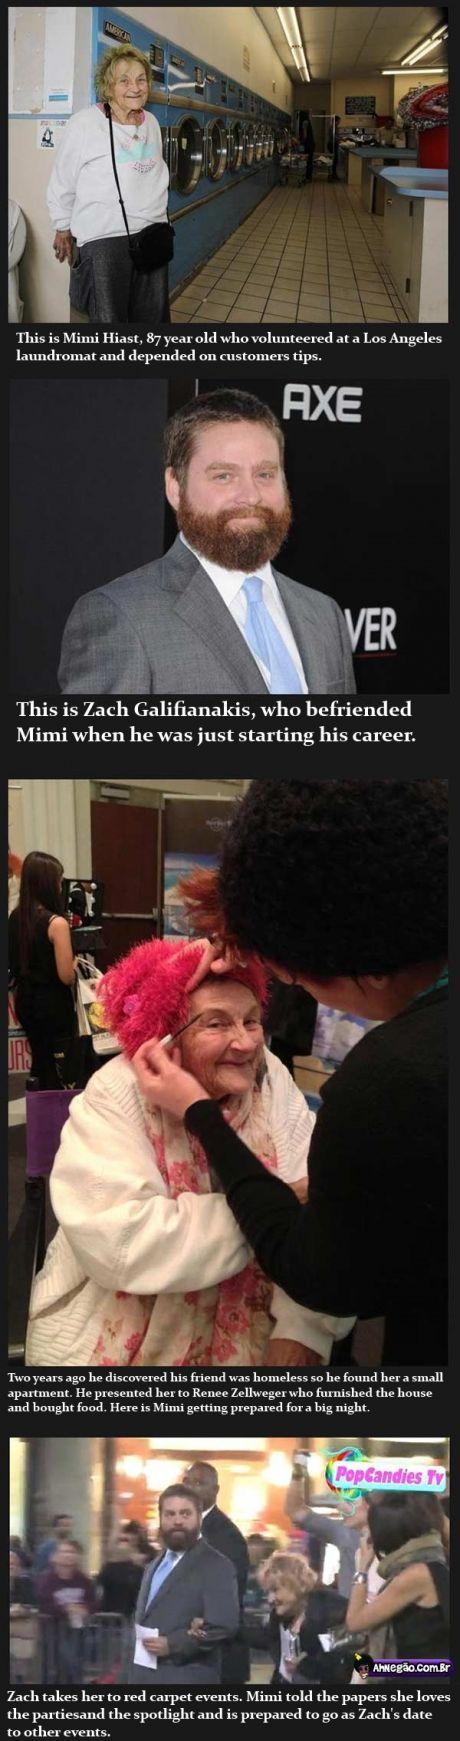 Zach Galifianakis is a good man — Faith in humanity restored!